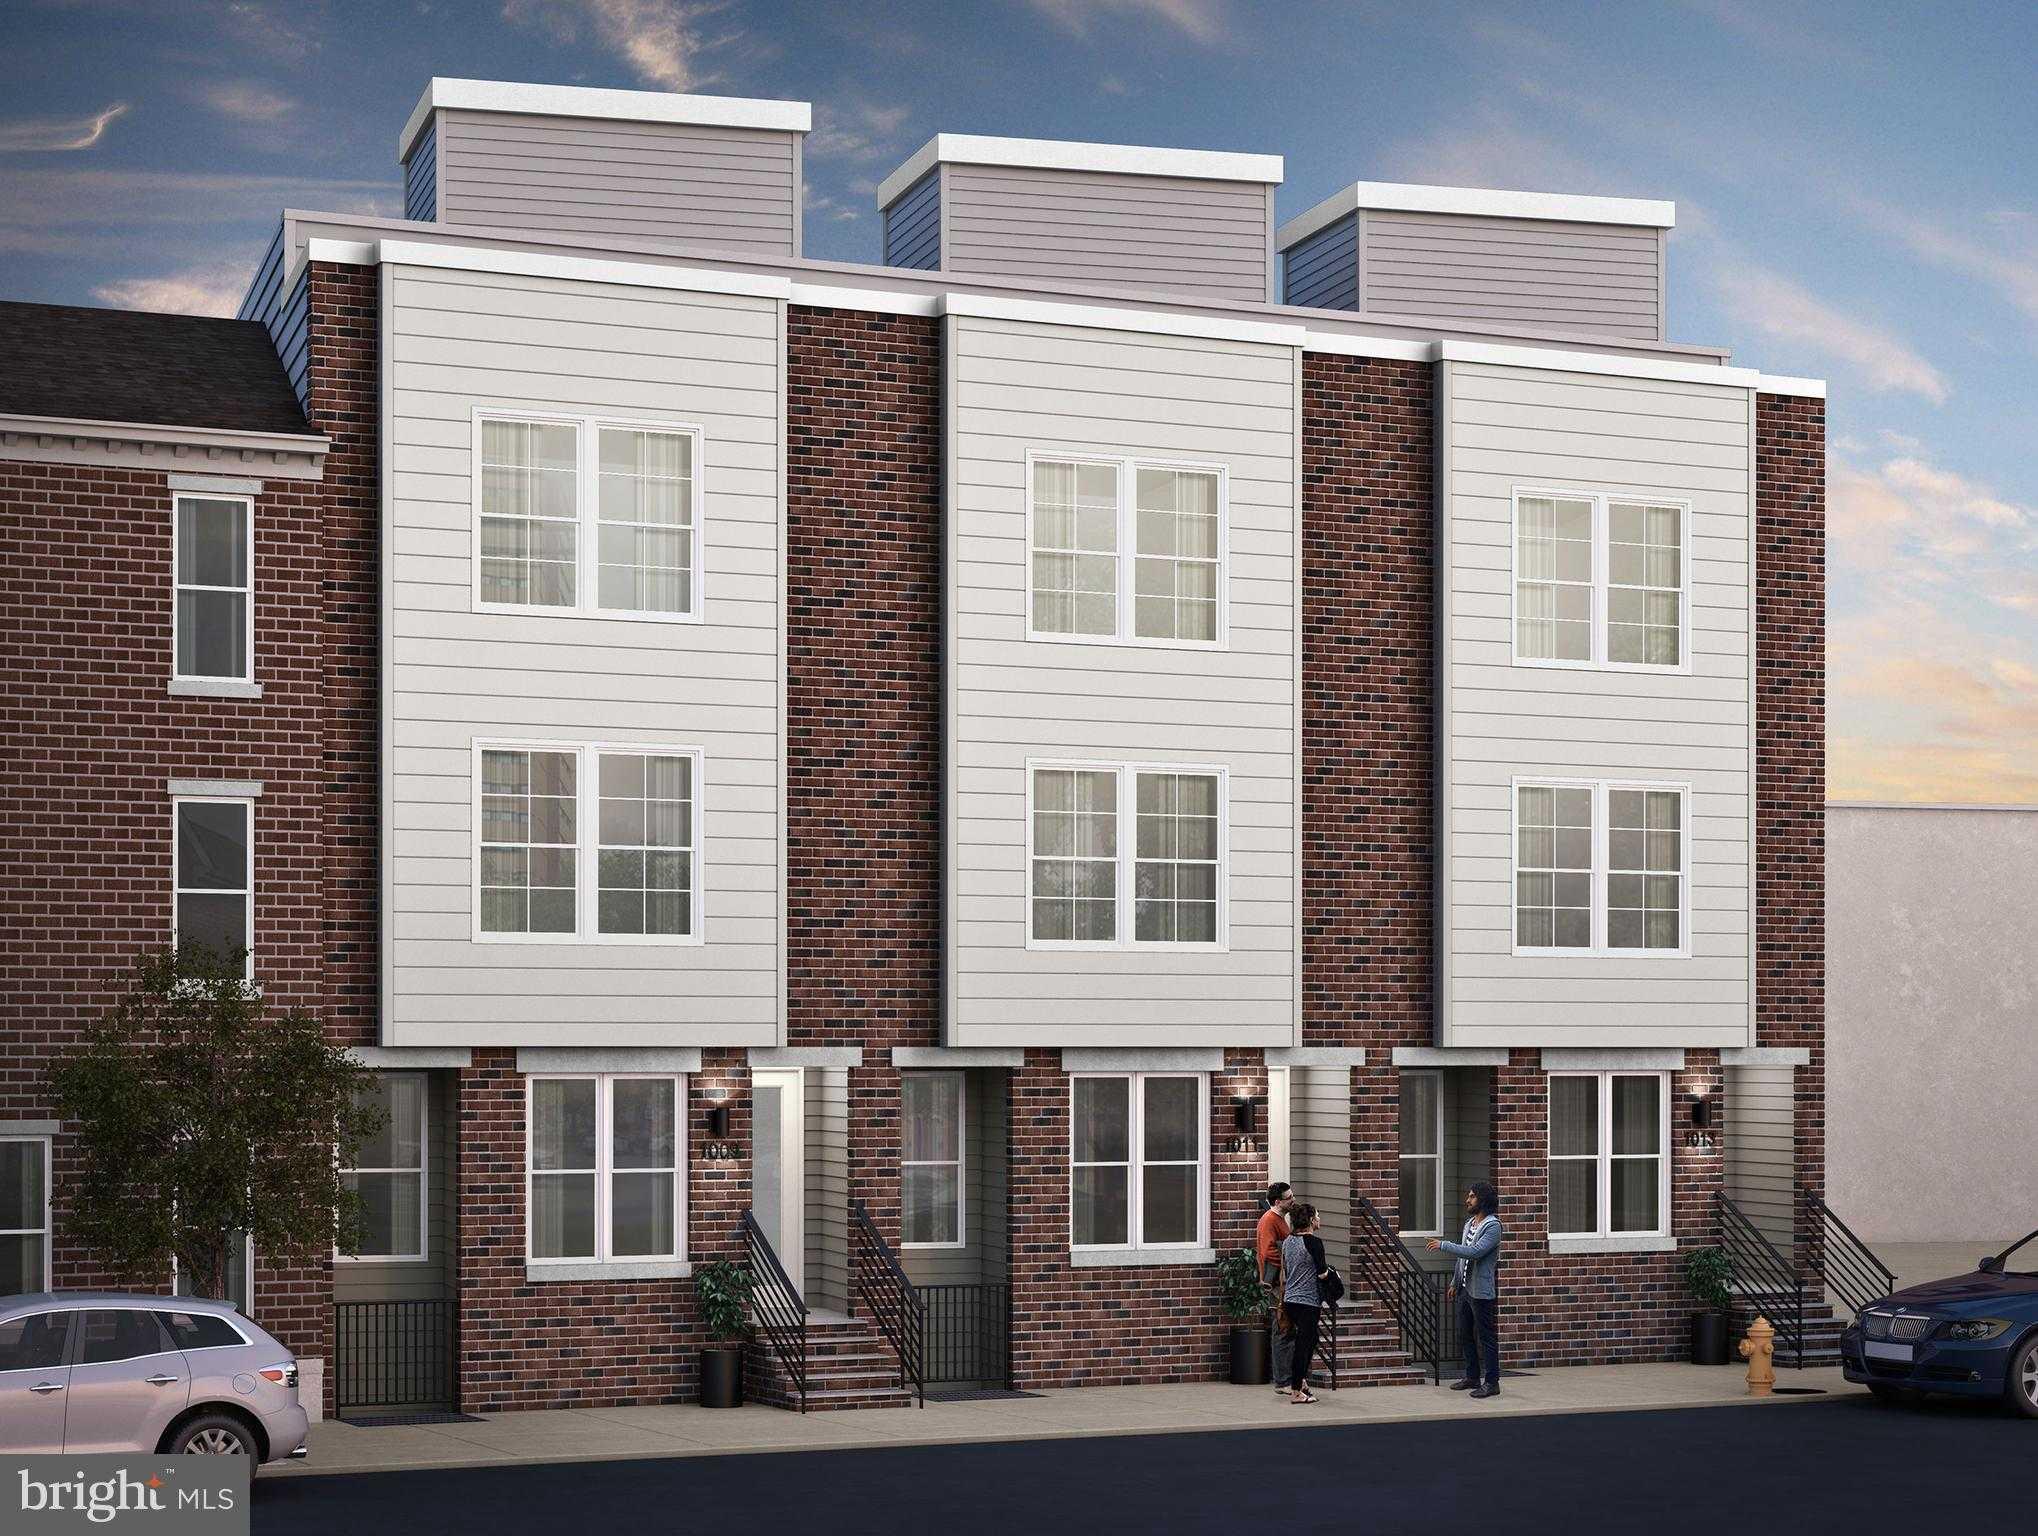 $320,000 - 1Br/1Ba -  for Sale in Queen Village, Philadelphia